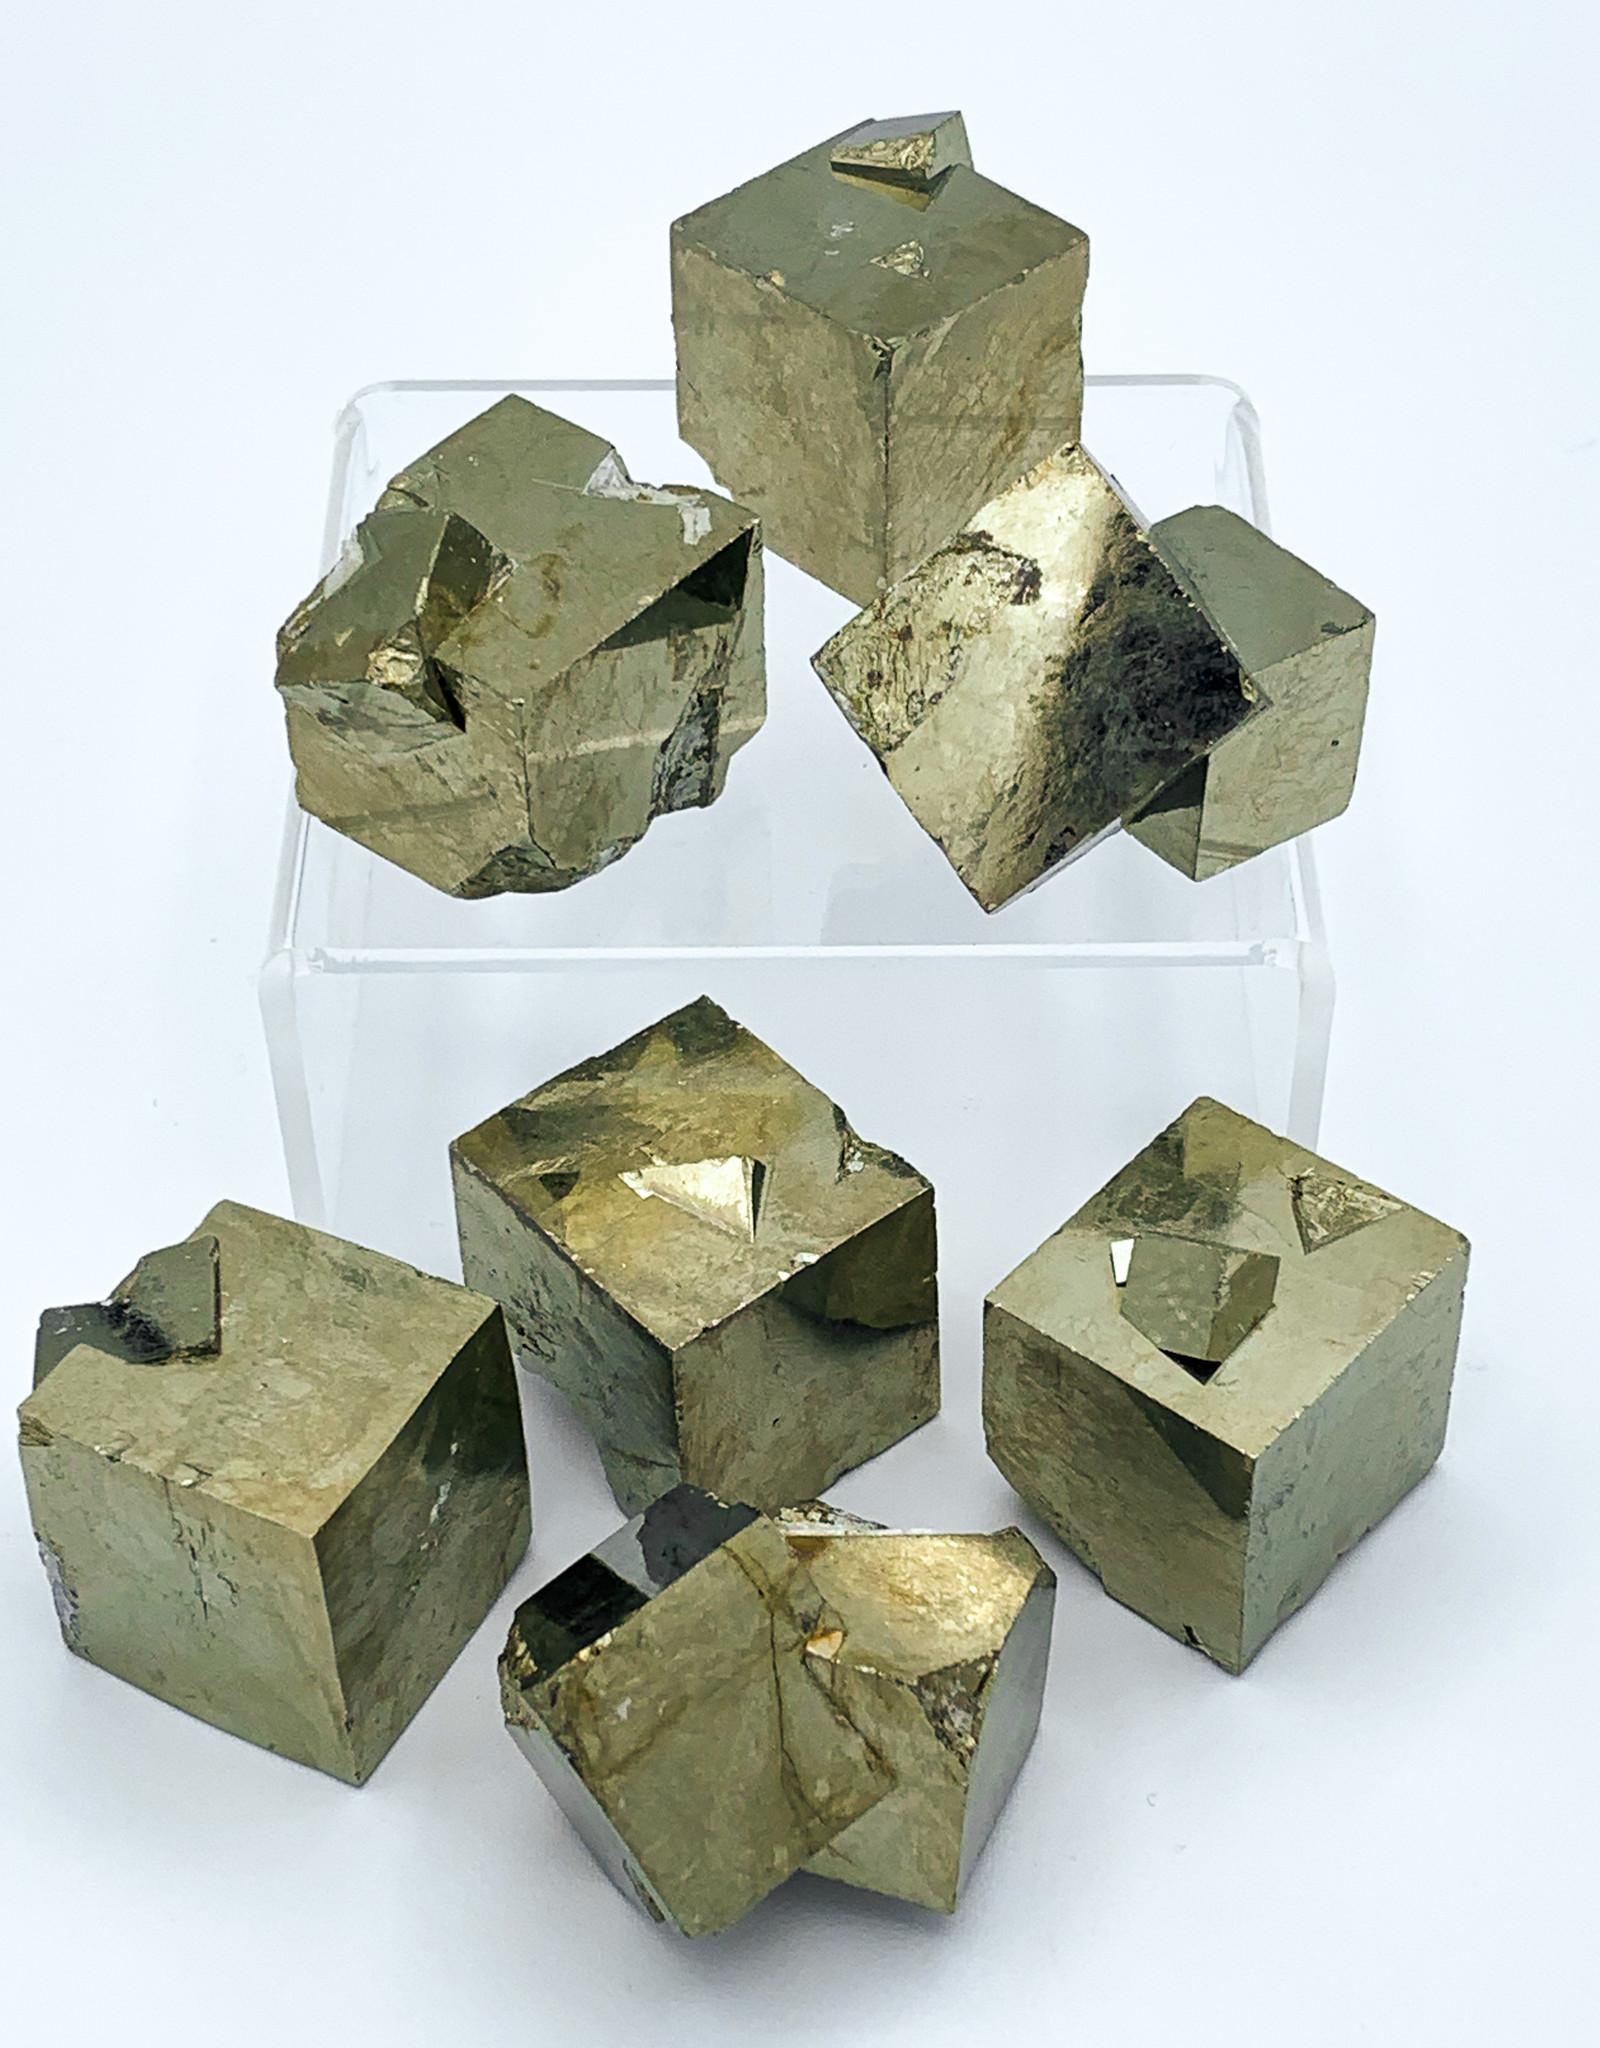 Cubic Pyrite - Navajún, Spain